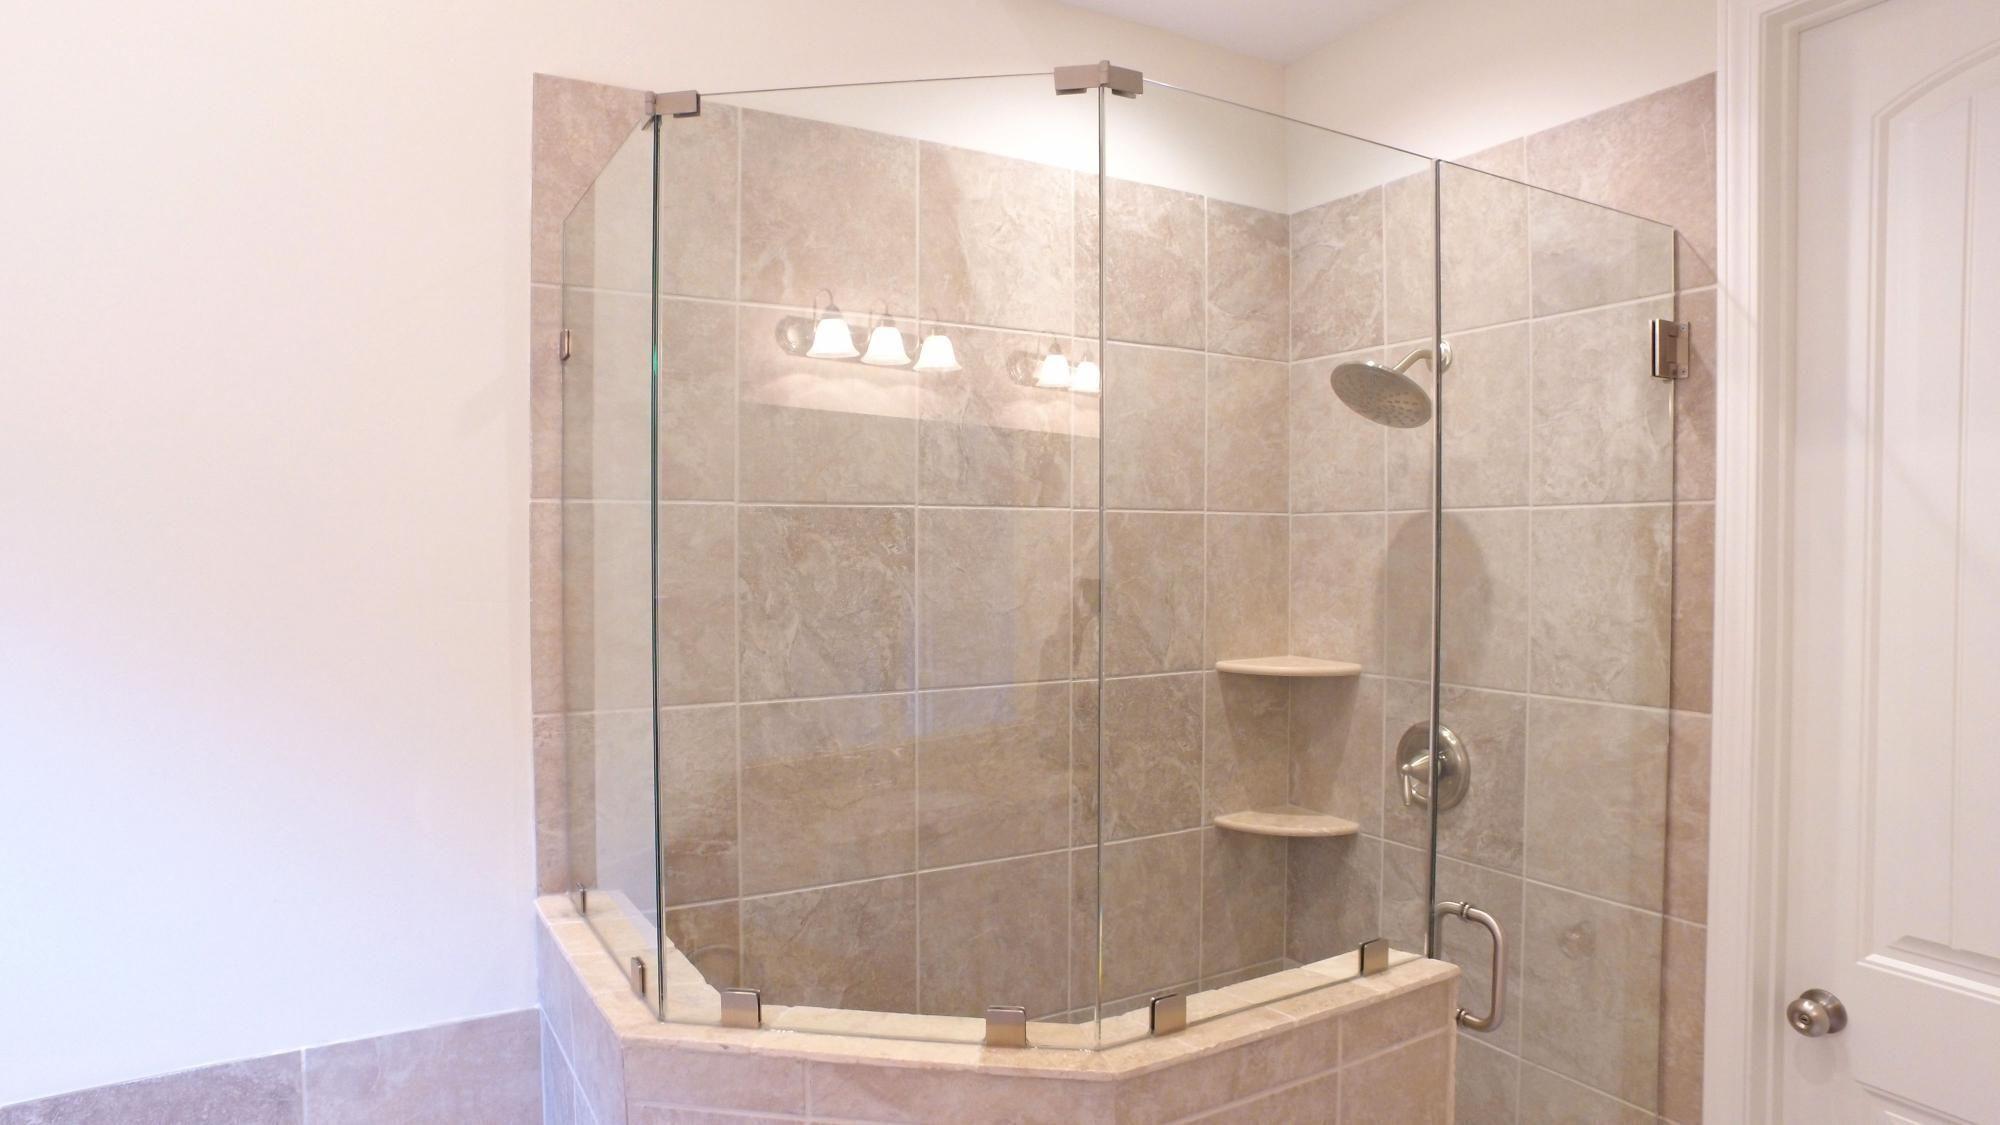 Bathroom featured in the Newcastle By Regency Homebuilders in Memphis, TN